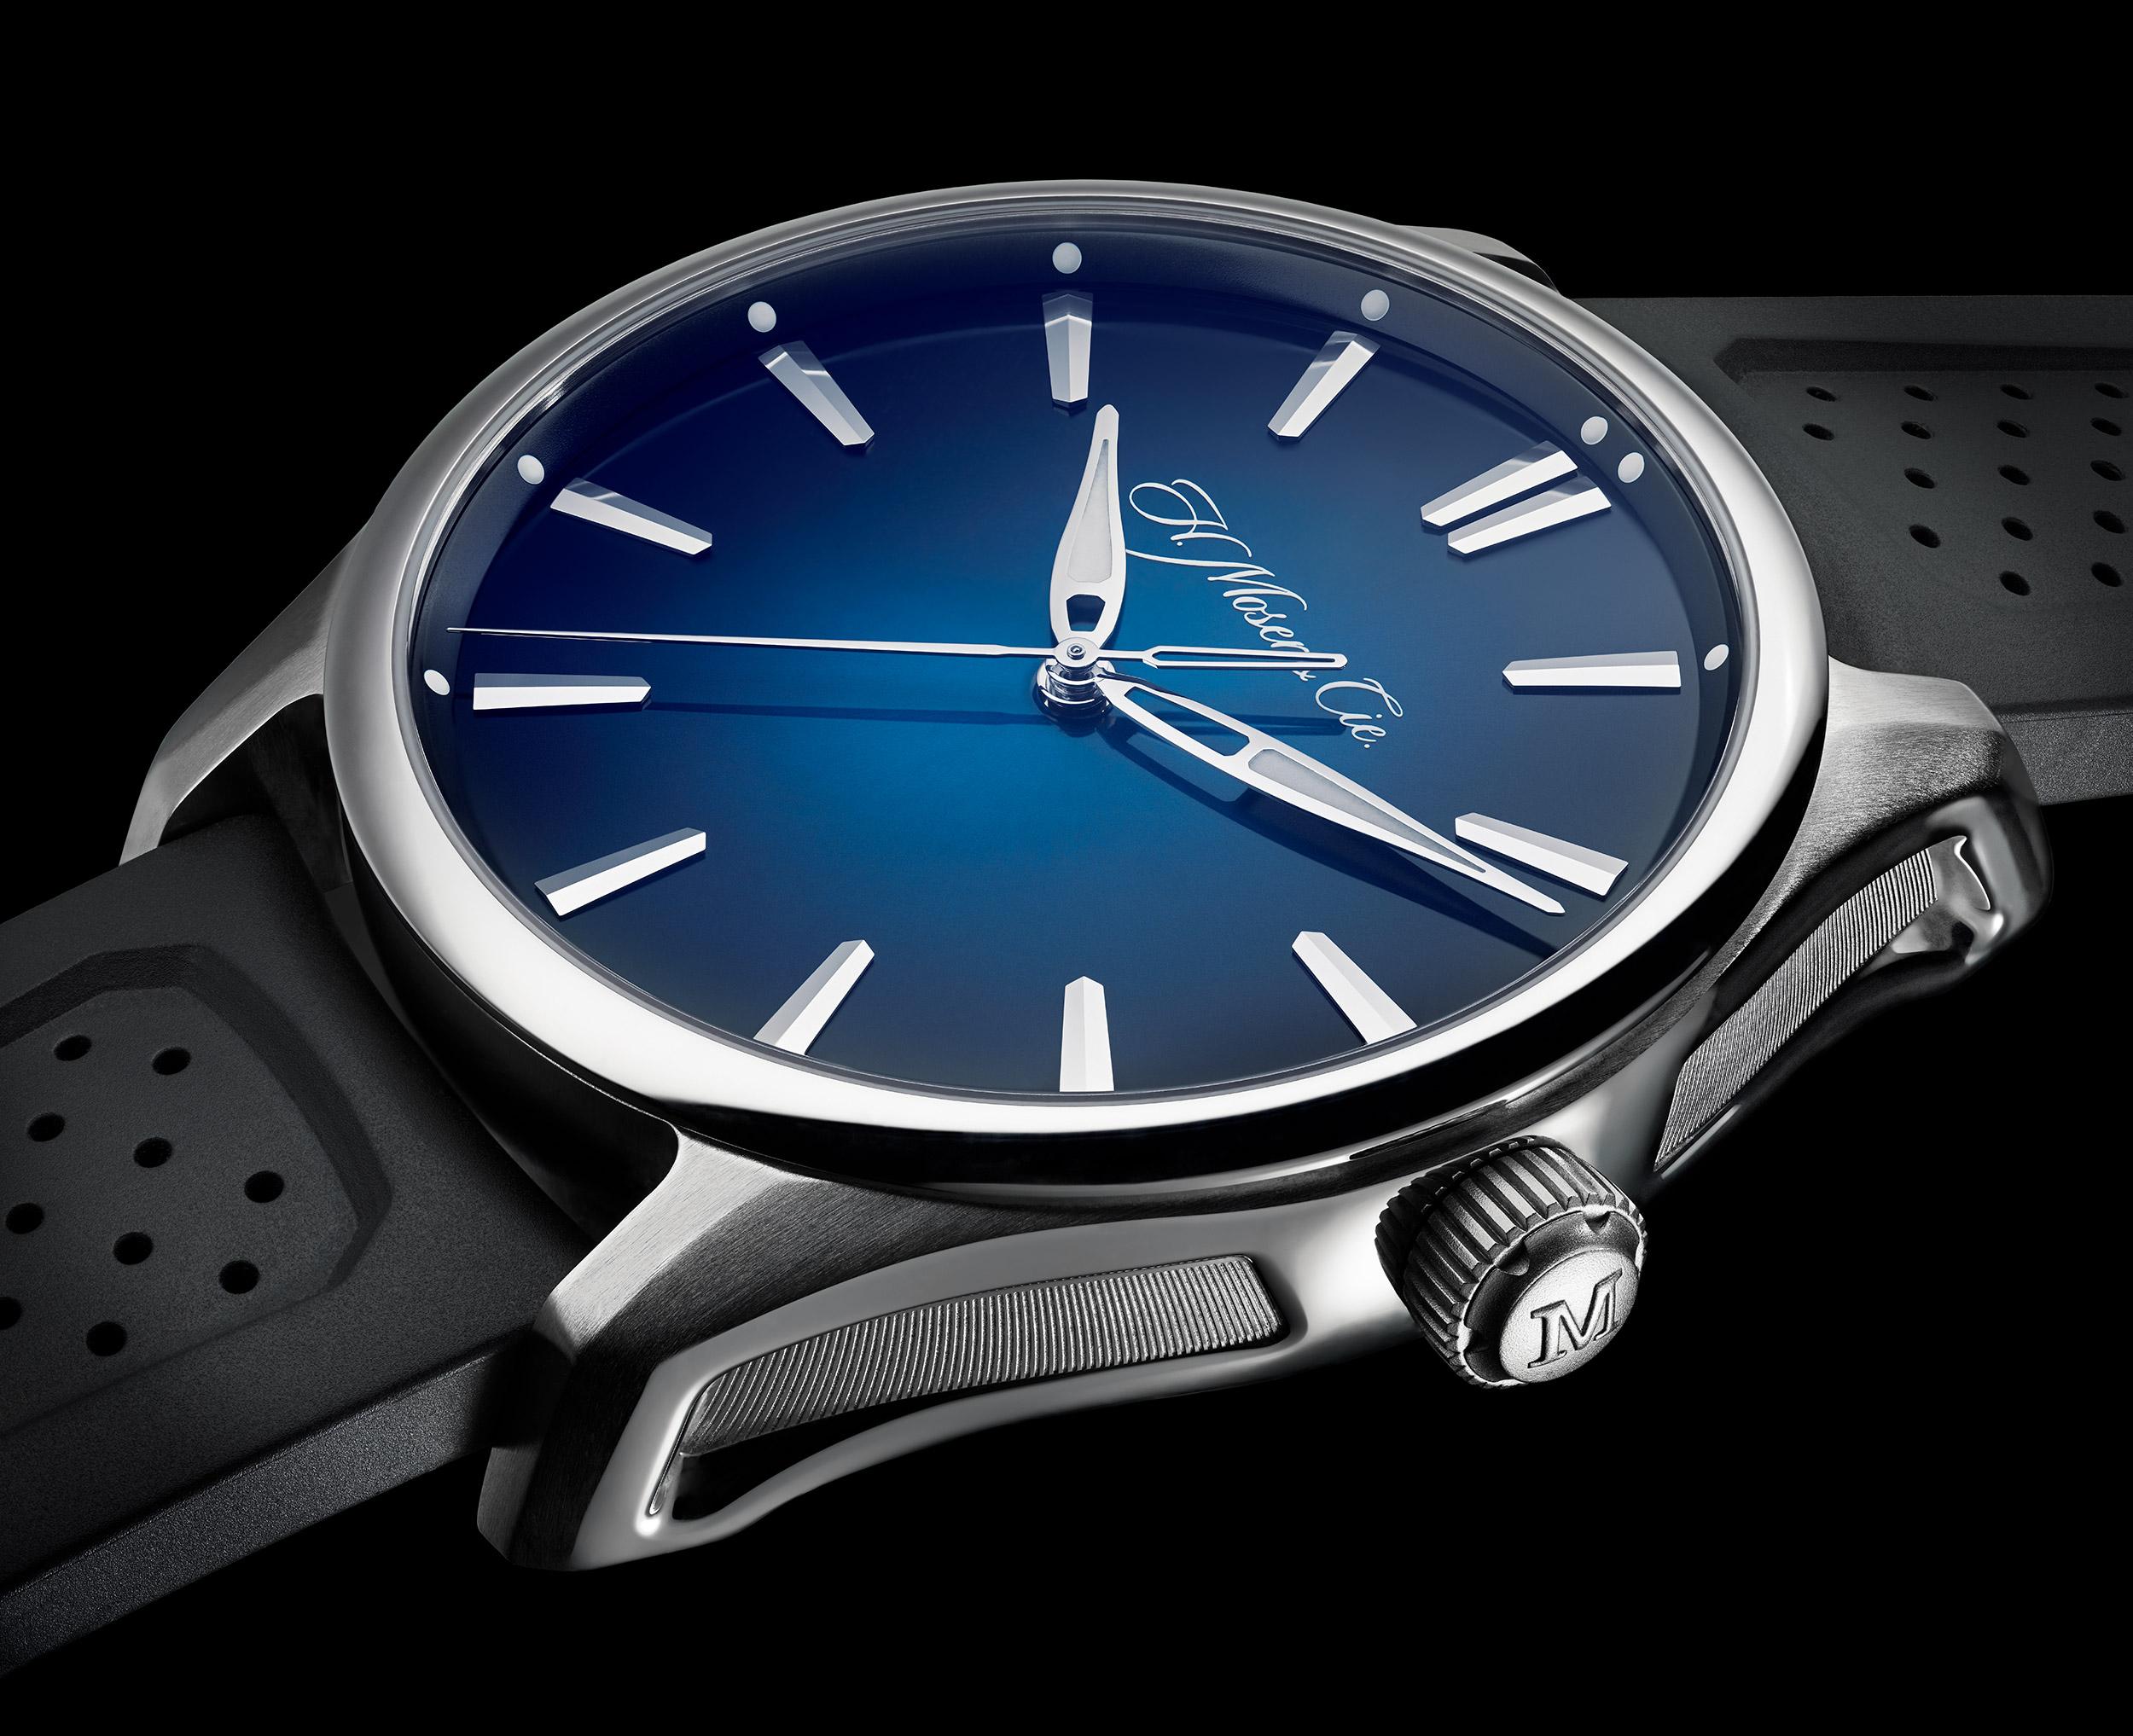 H. Moser & Cie Watch